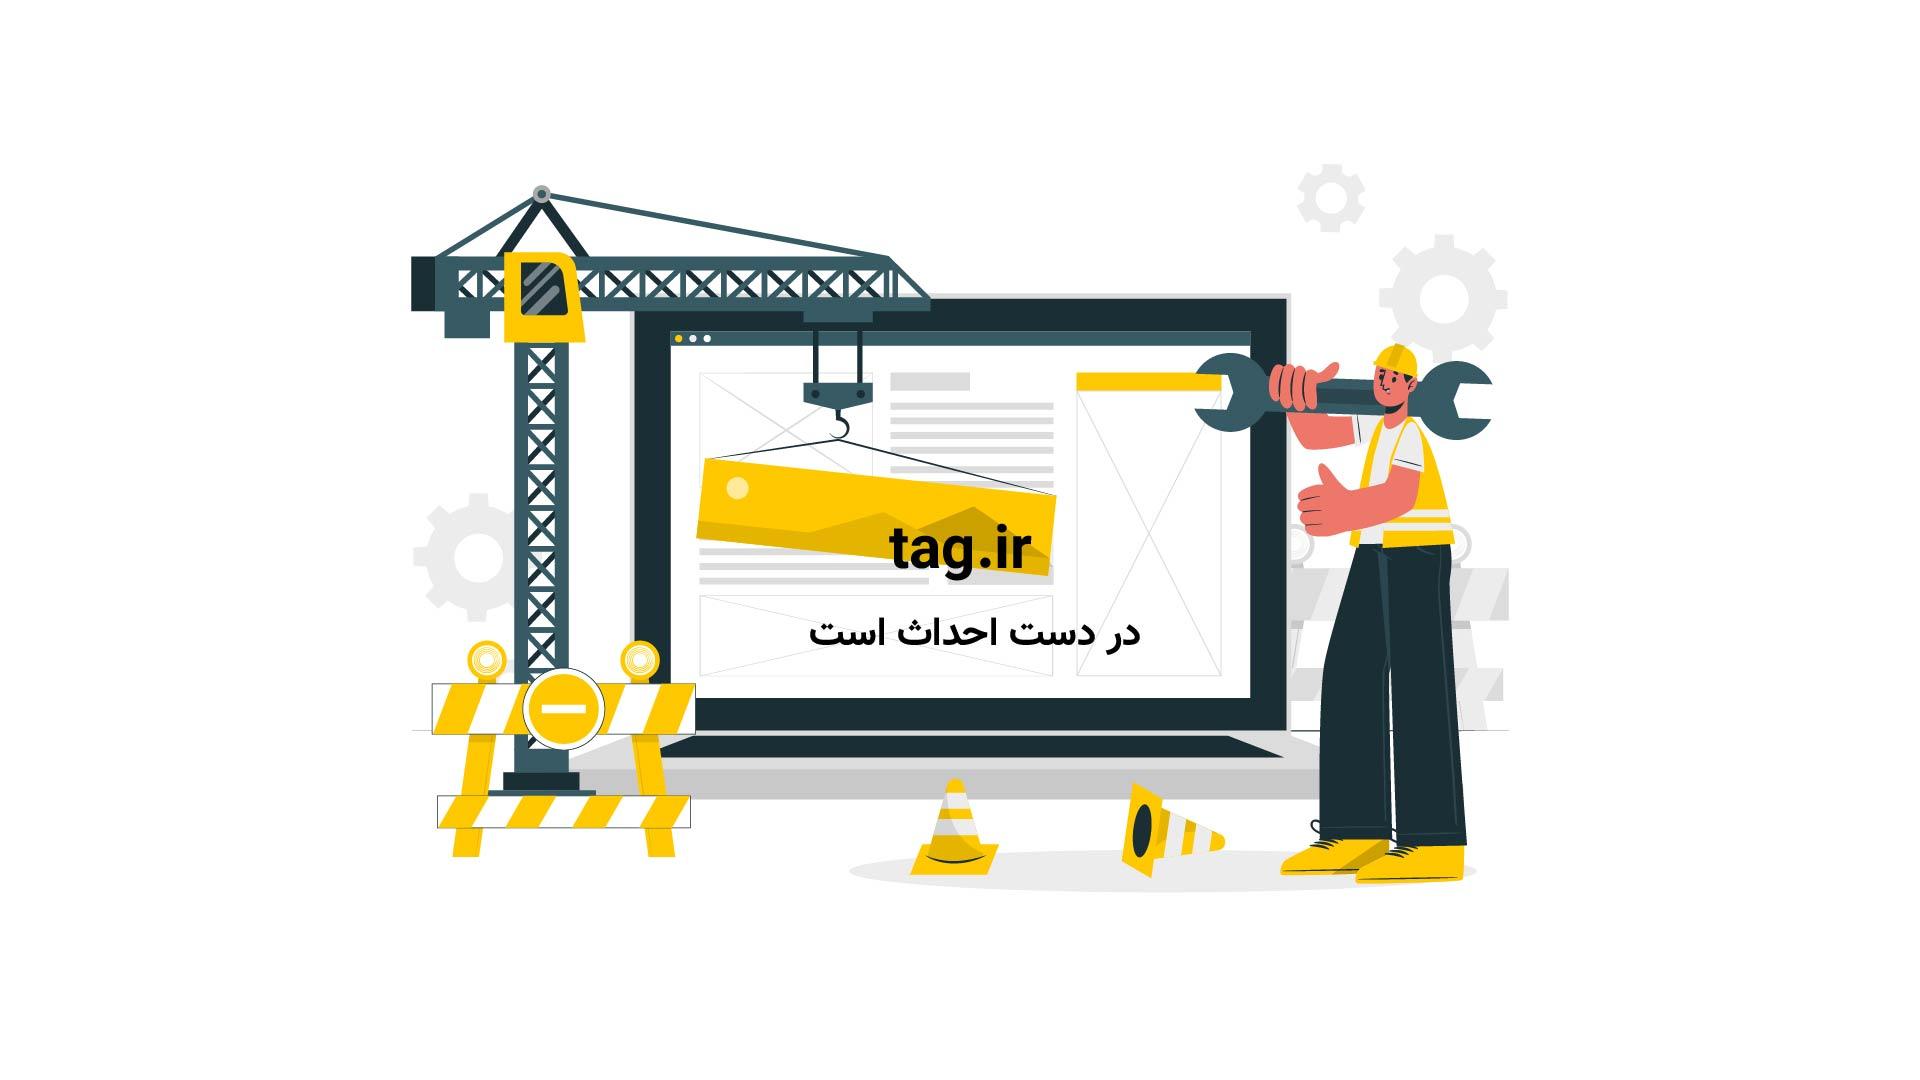 گربه سایمون گربه حسود | تگ